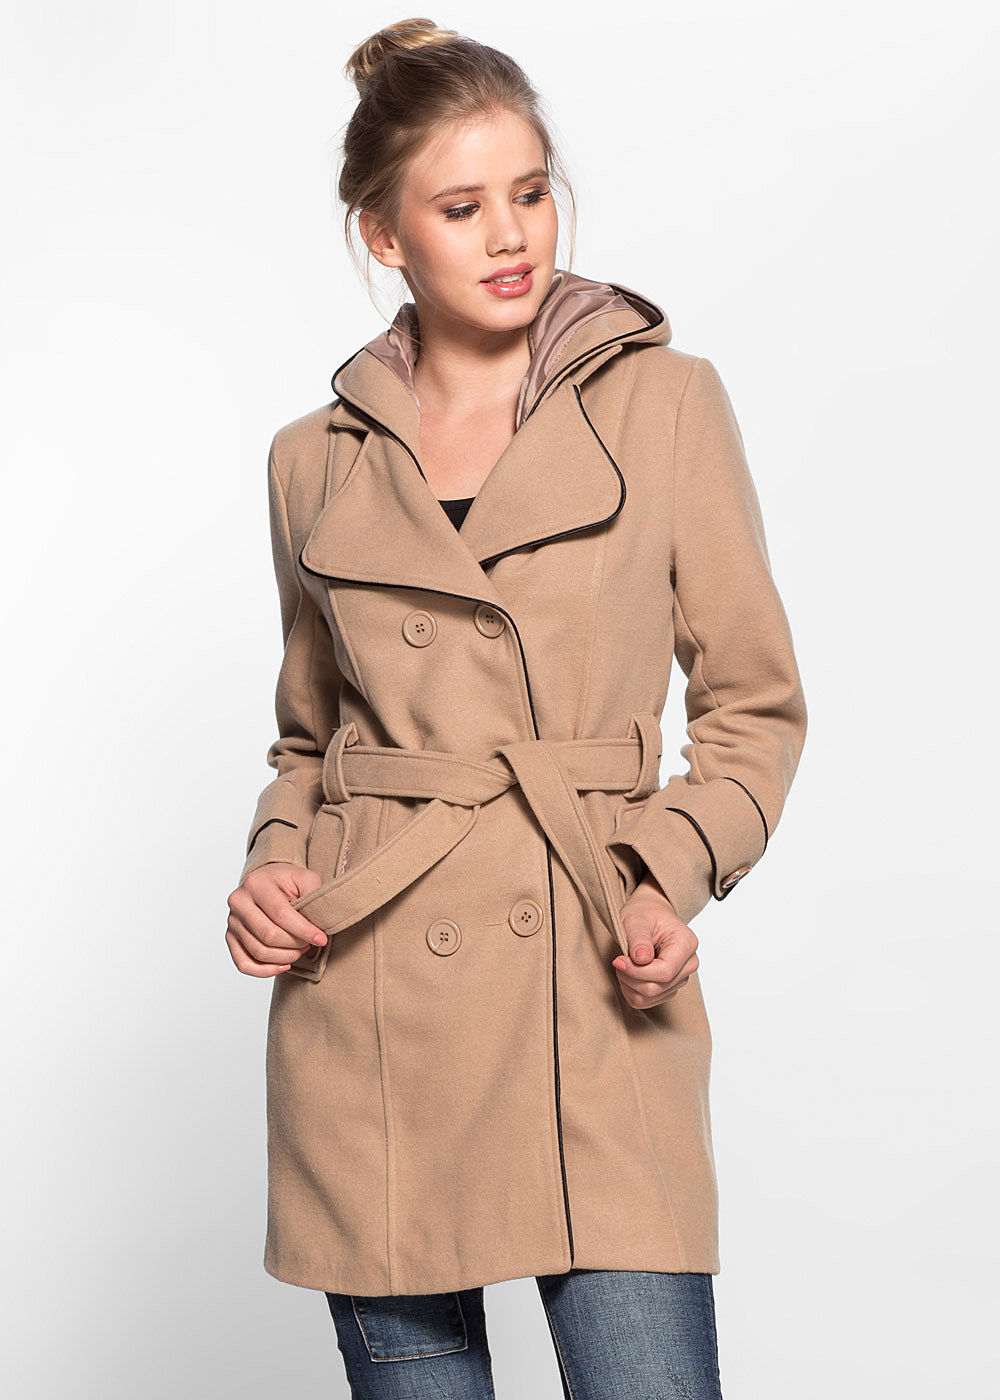 styleboom fashion damen fleece mantel abnehmbare kapuze doppelknopfreihe camel beige 77onlineshop. Black Bedroom Furniture Sets. Home Design Ideas